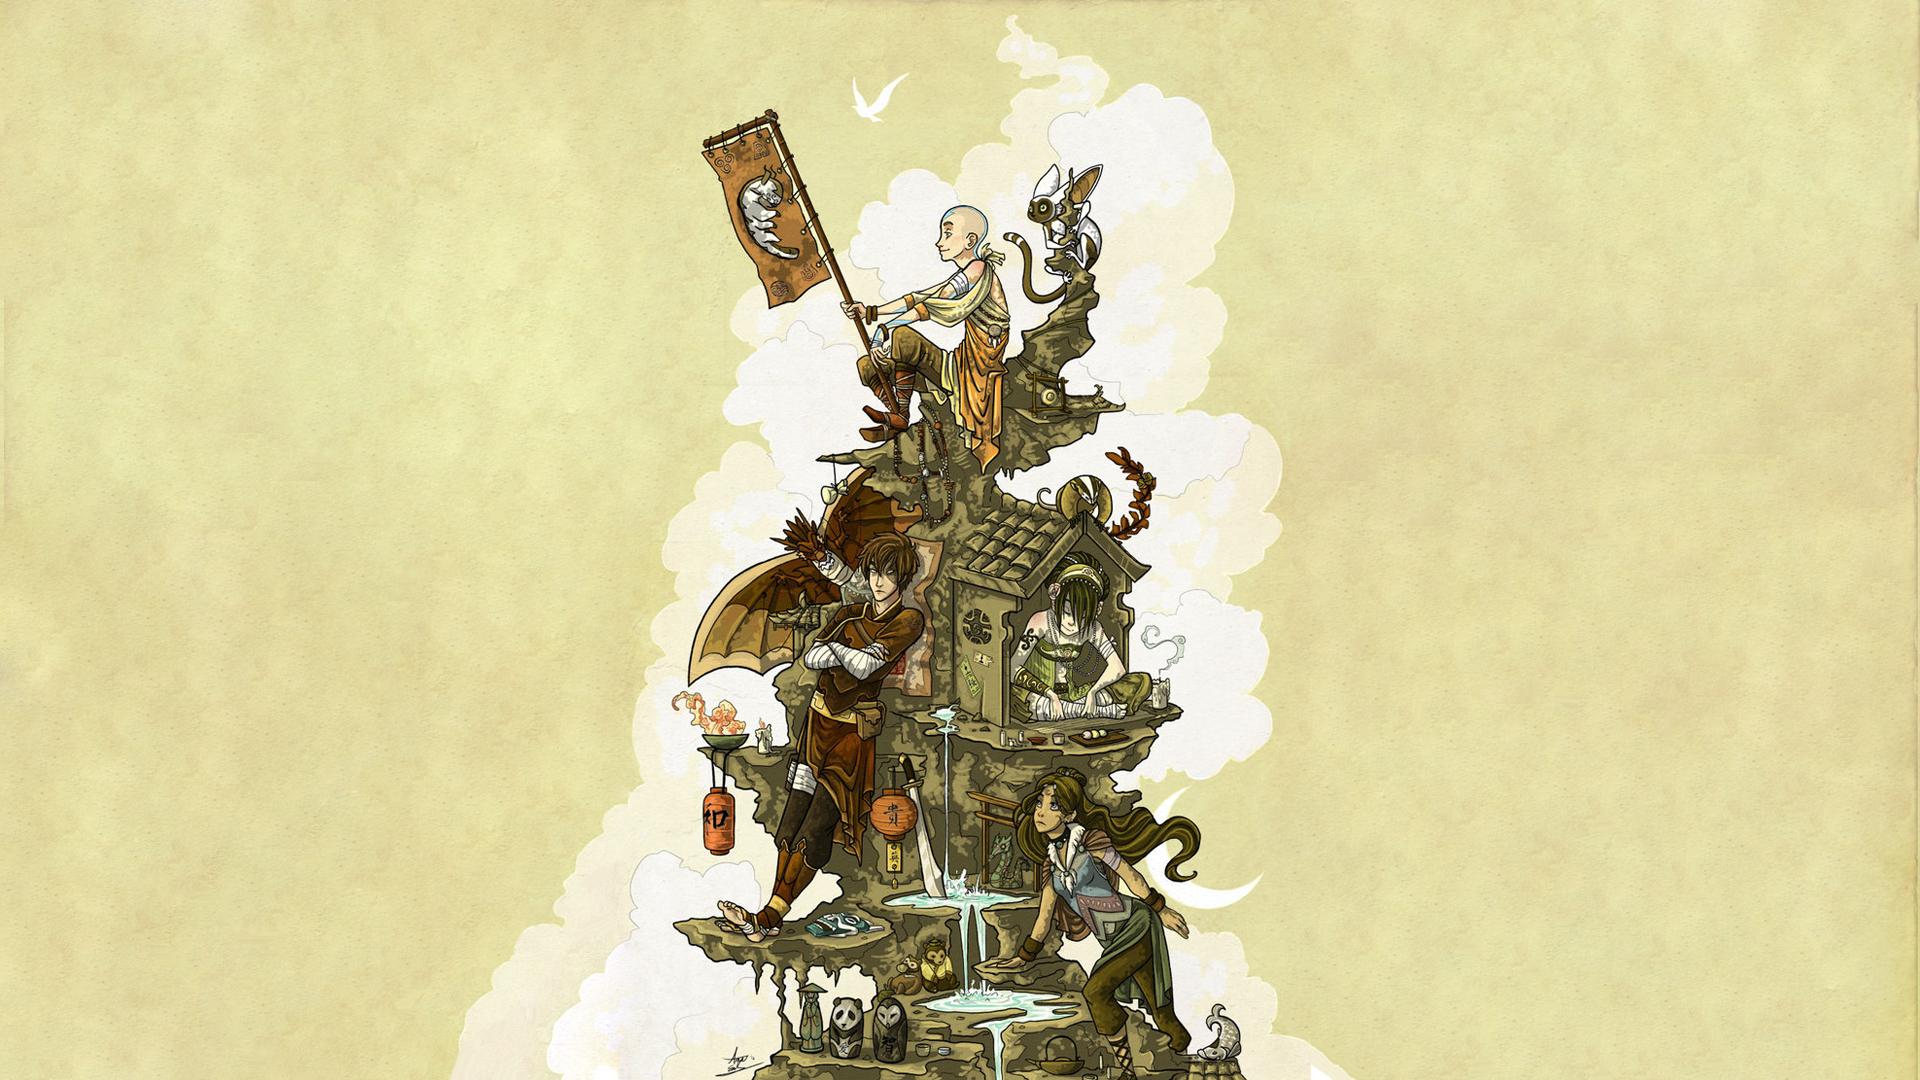 Avatar The Last Airbender da wallpaper | 1920x1080 ...